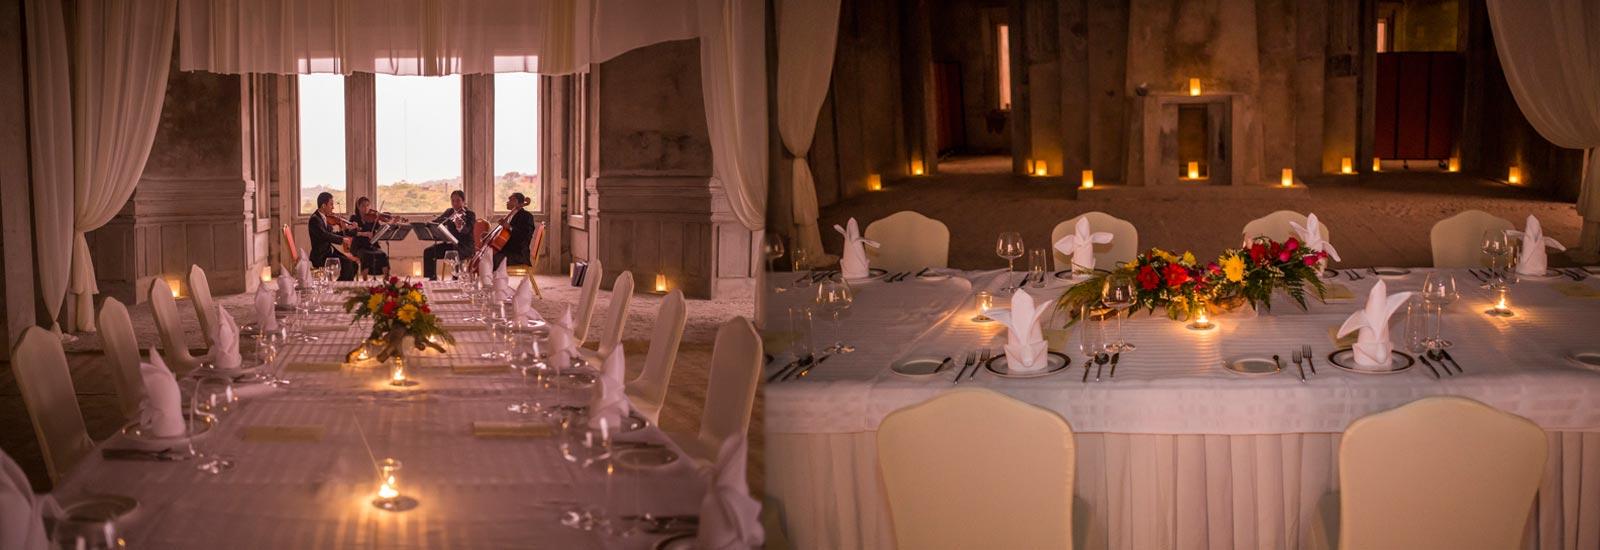 Le Bokor Palace Dinner